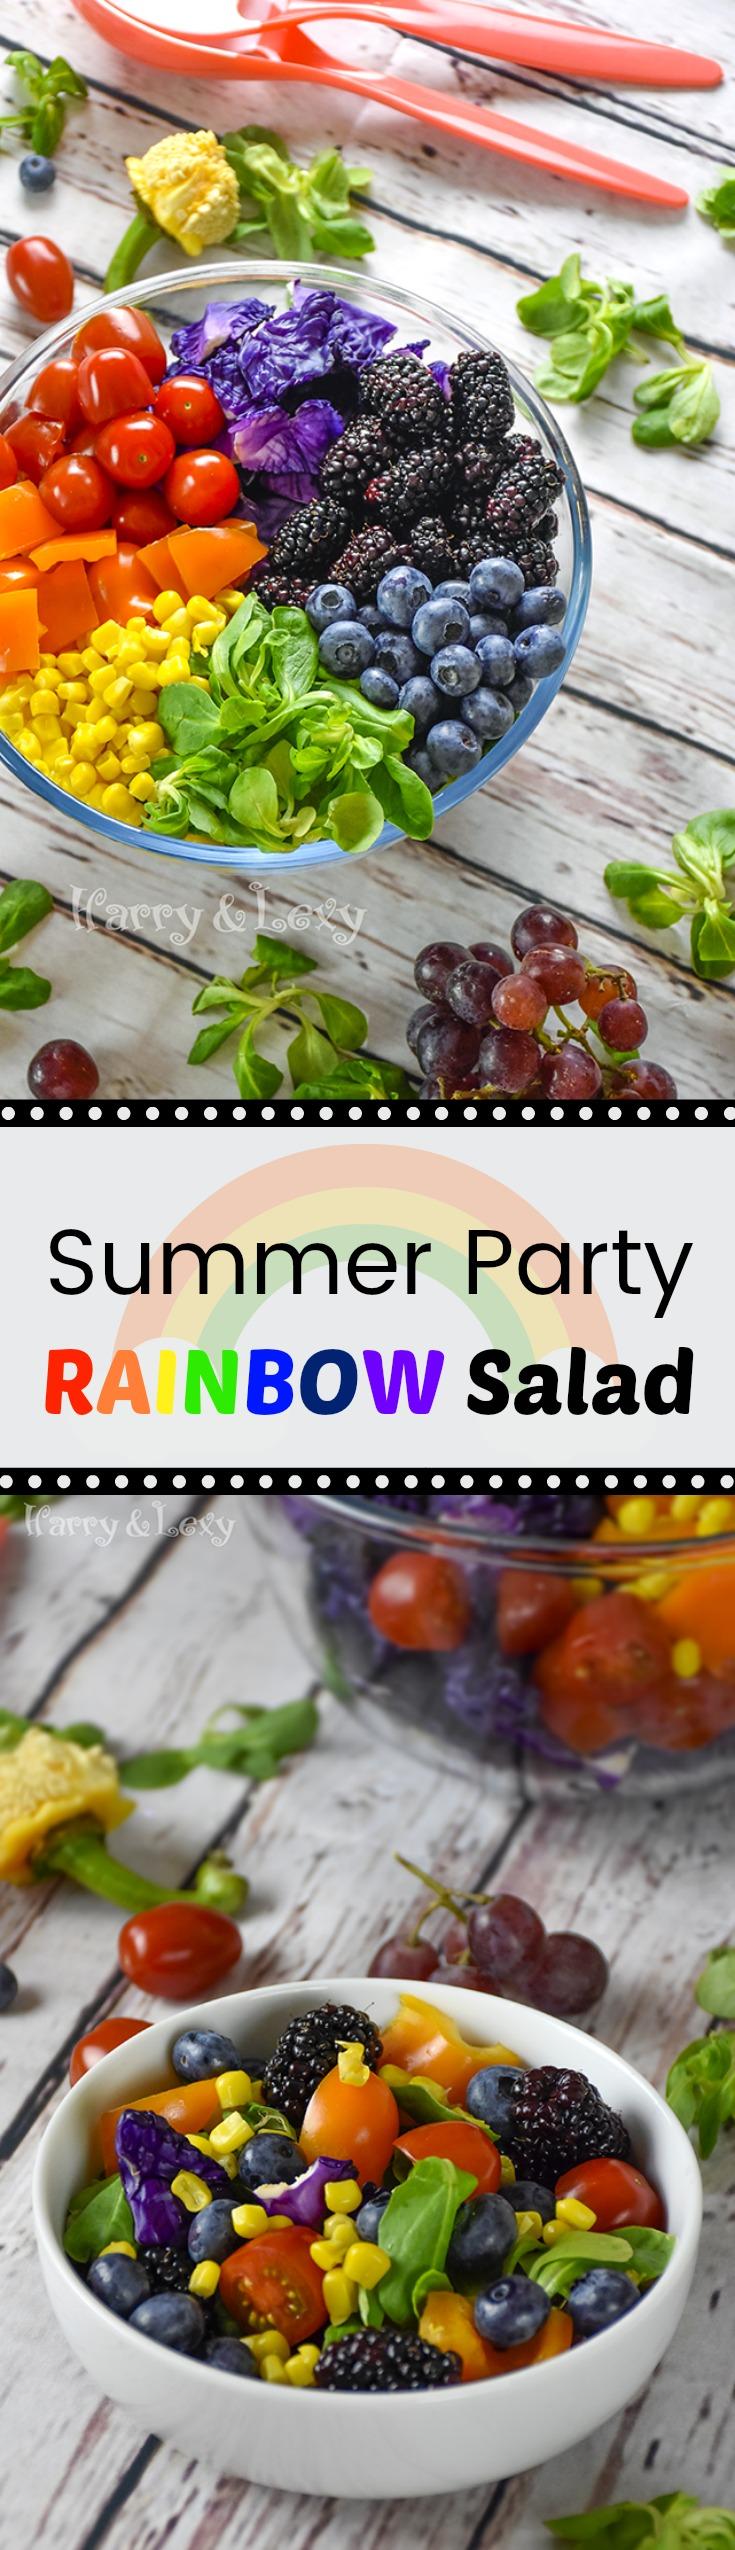 Summer Party Rainbow Salad